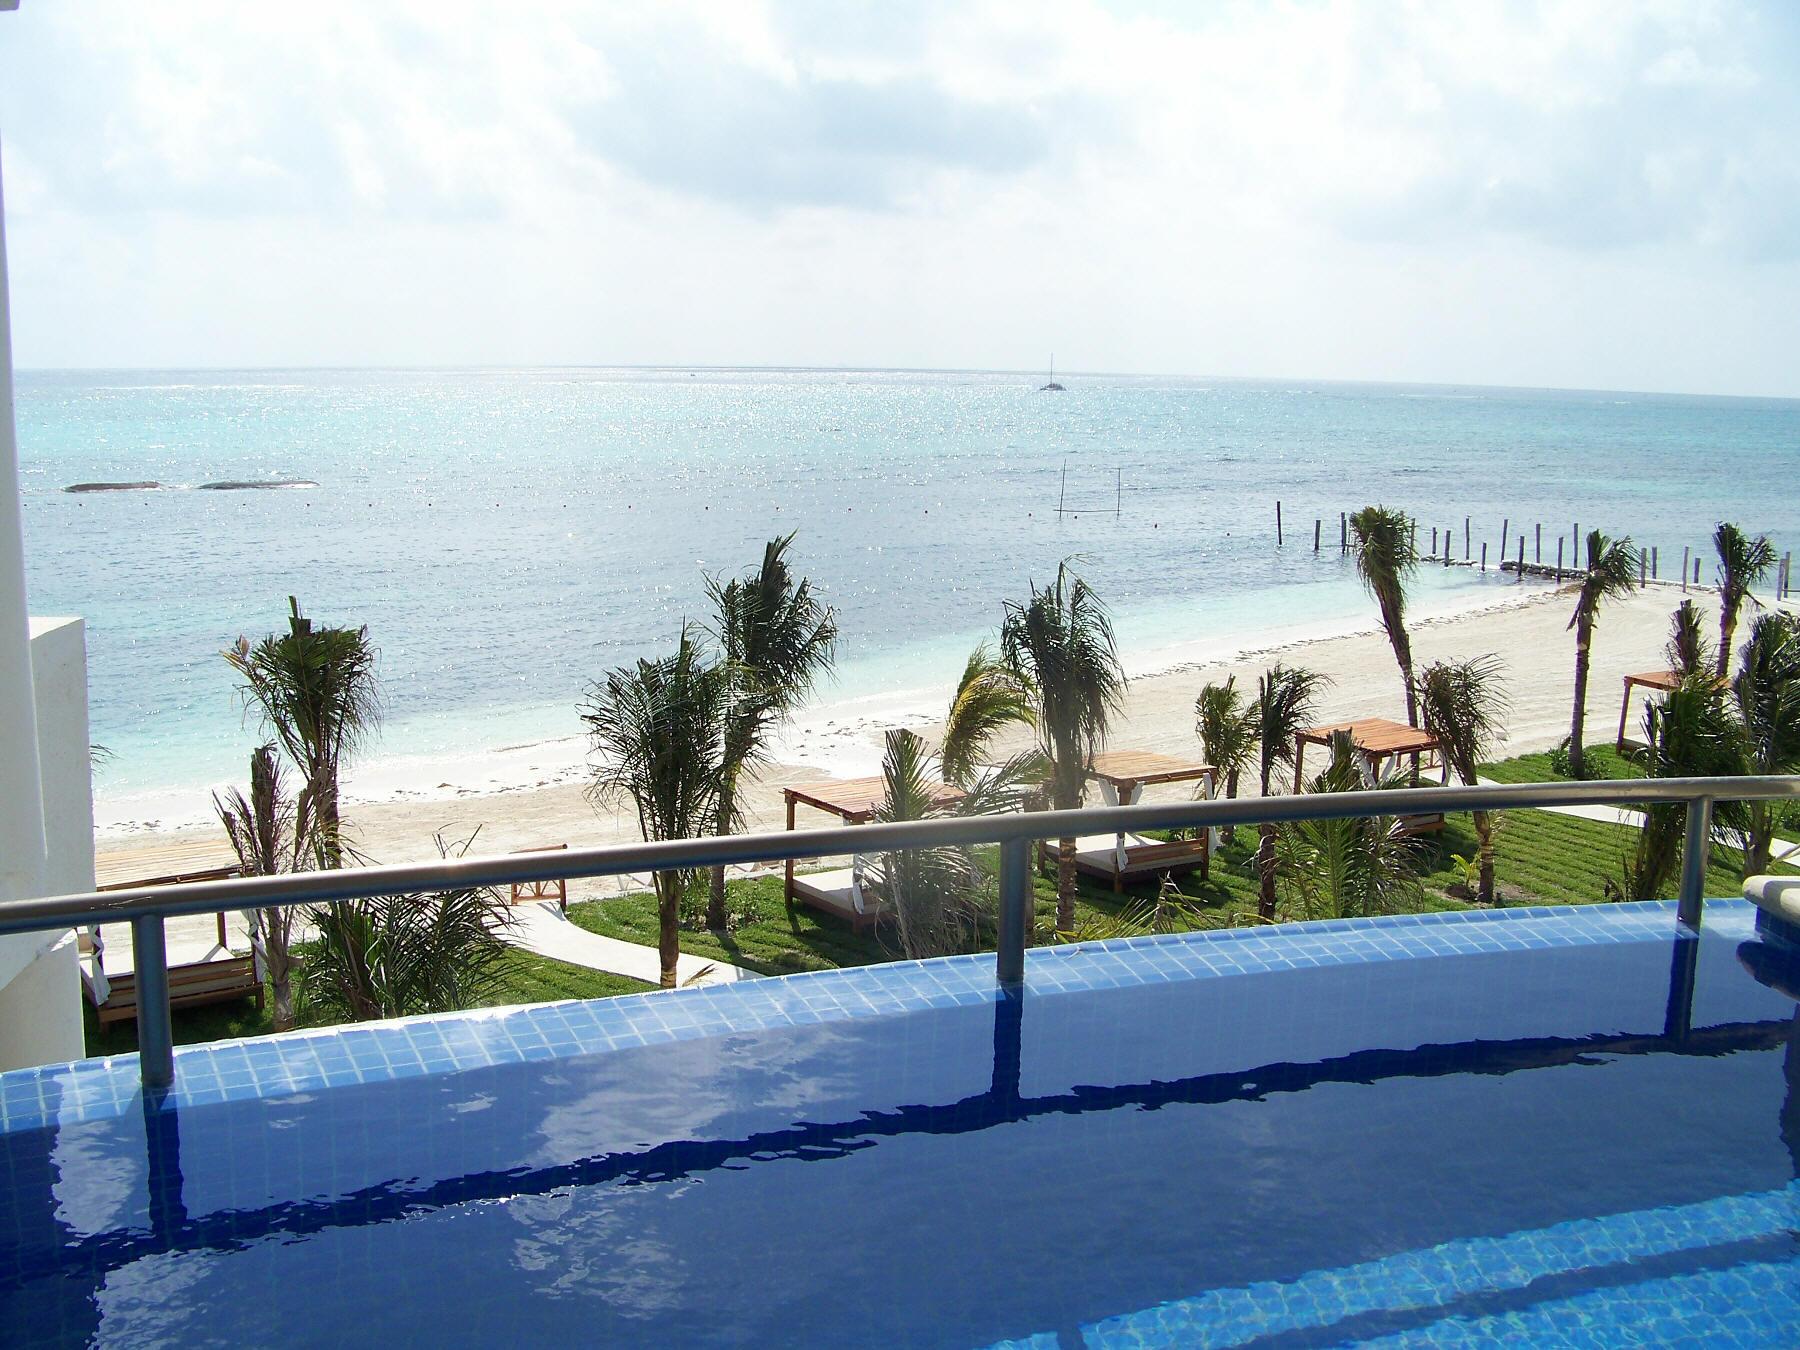 El Dorado Maroma Resort - Maroma Beach, Riviera Maya